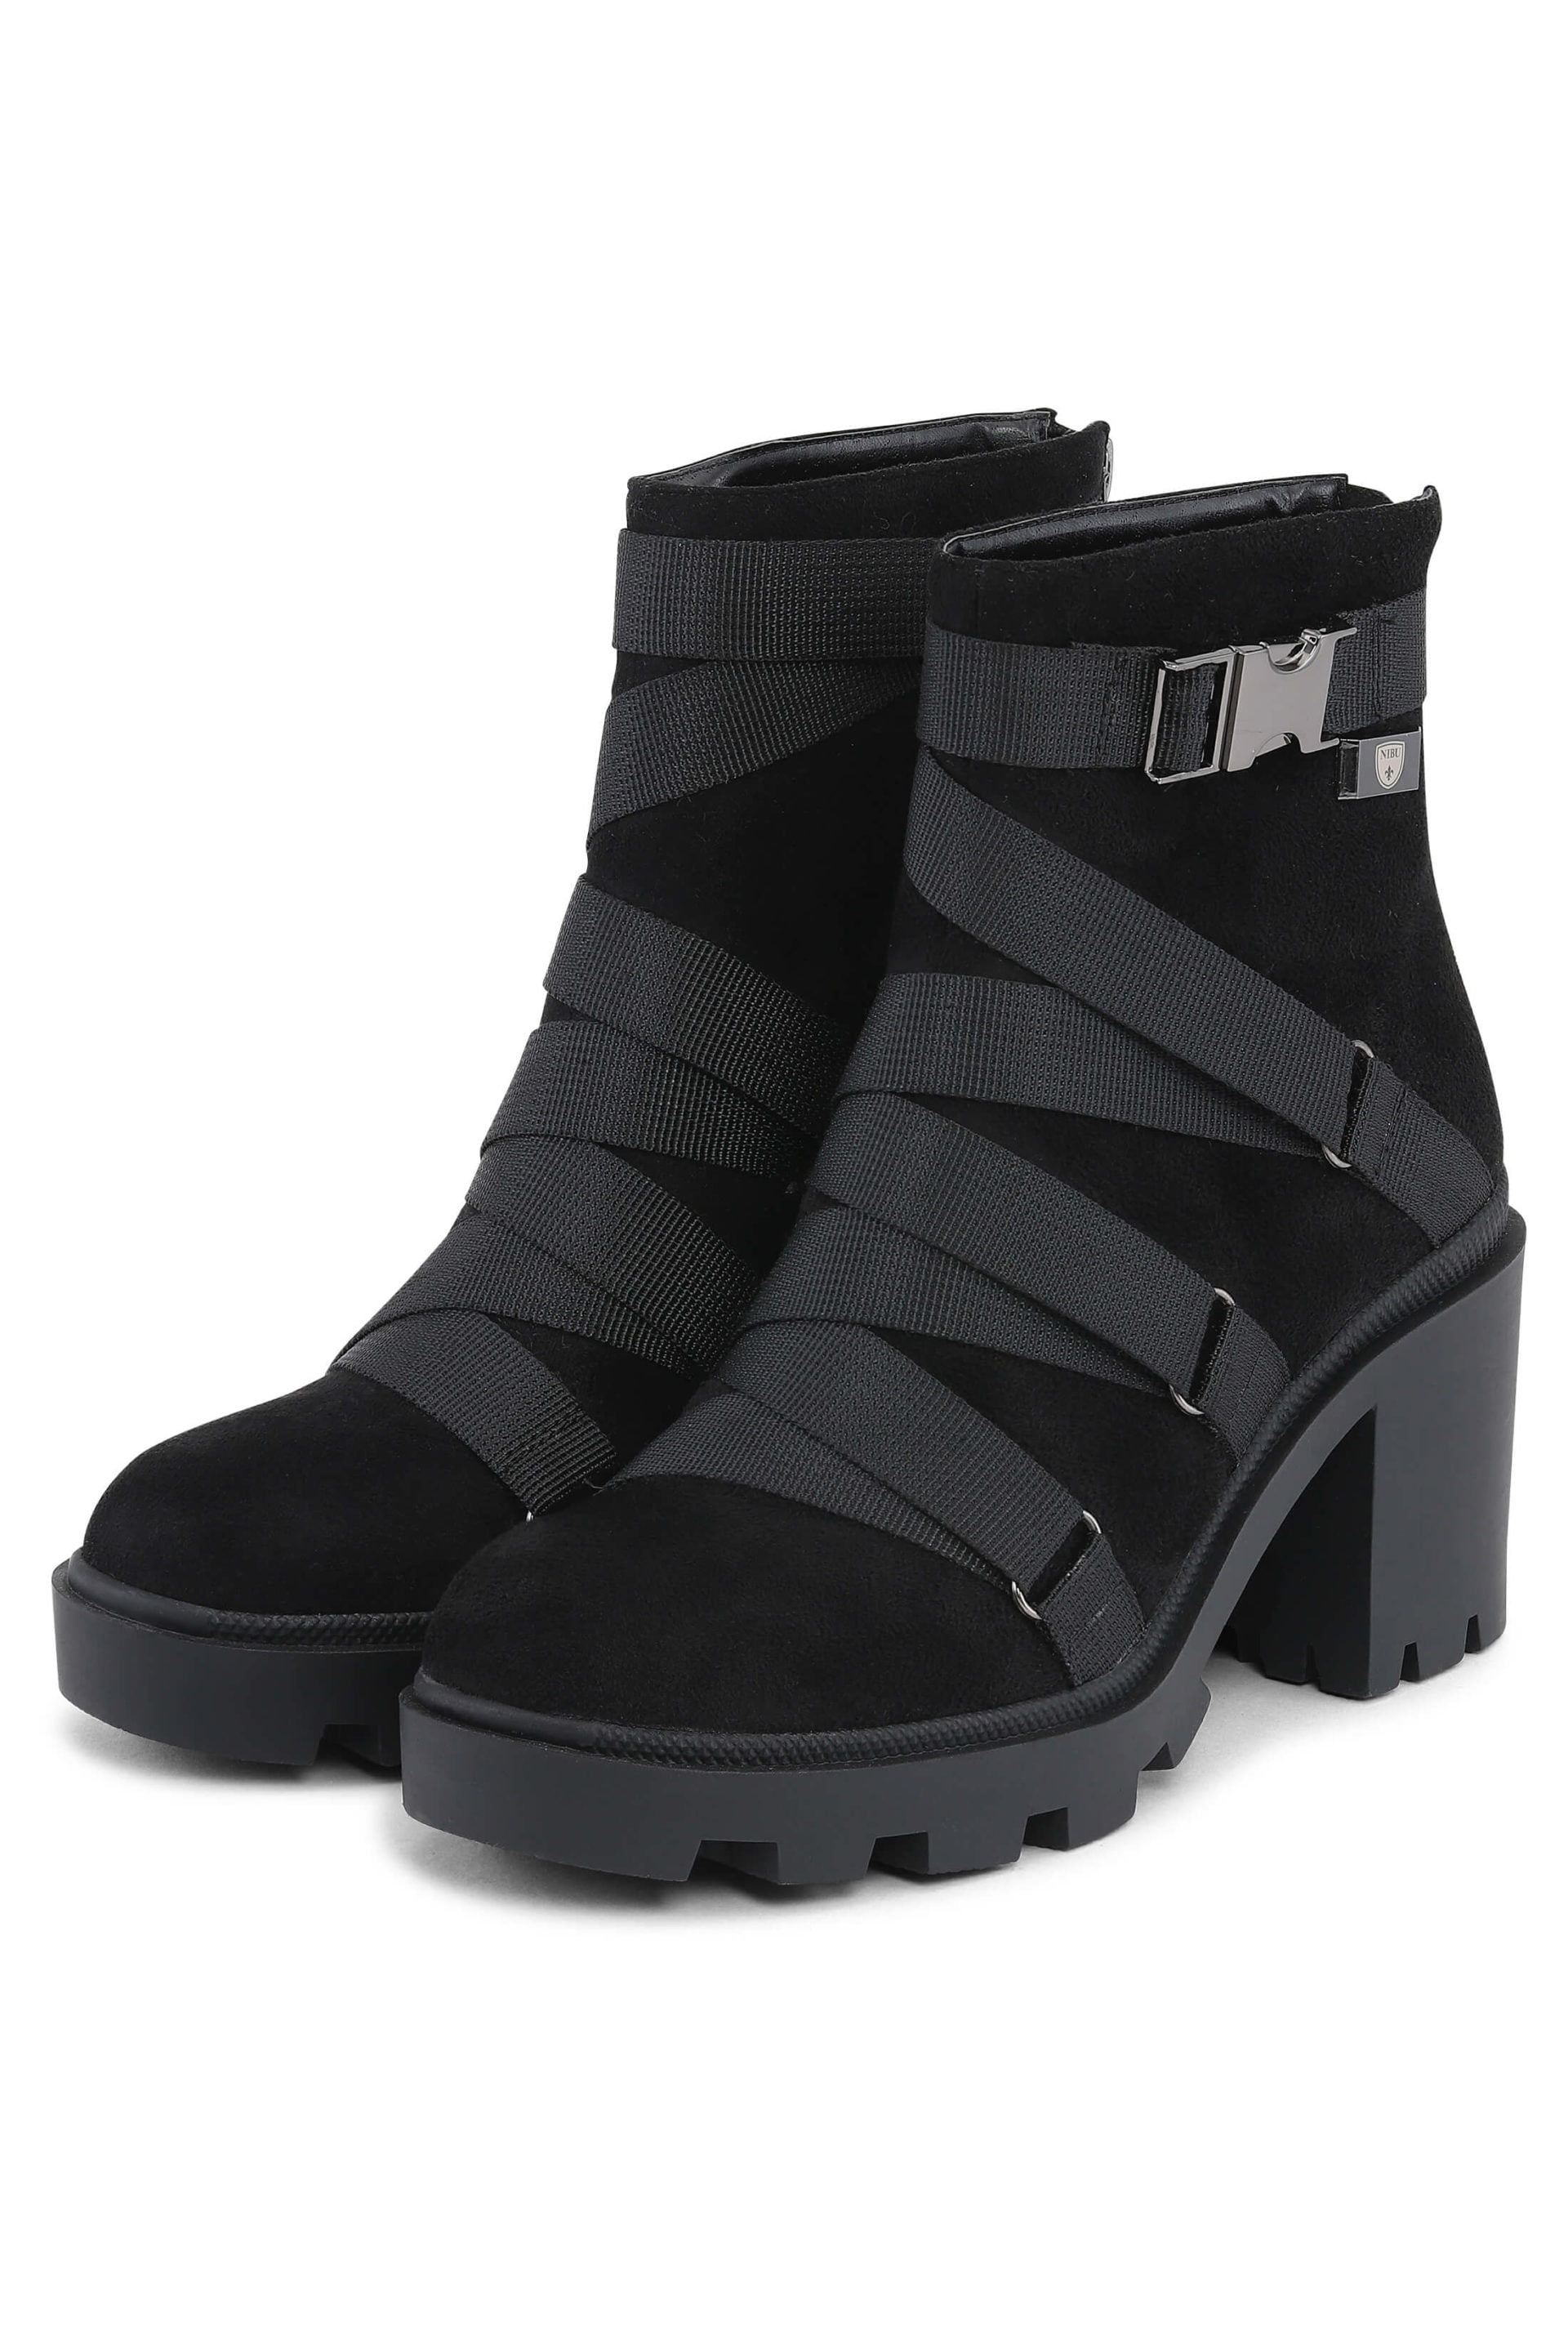 Black winterboots with high heels